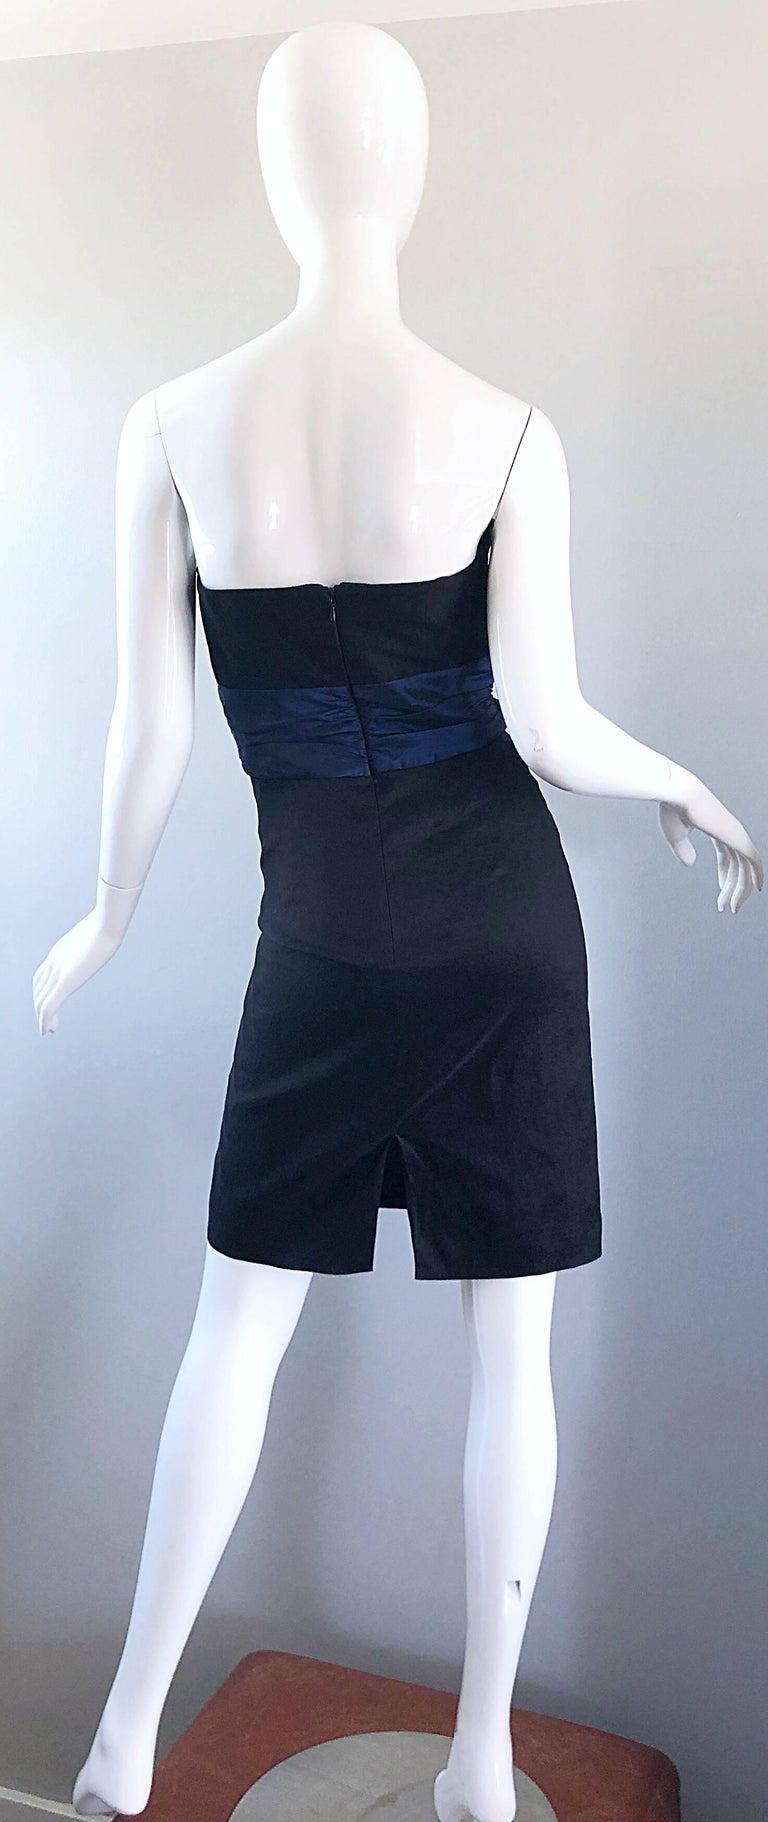 Badgley Mischka 1990s Sz 4 Vintage Avant Garde Black Navy Blue Sequin Mini Dress For Sale 1